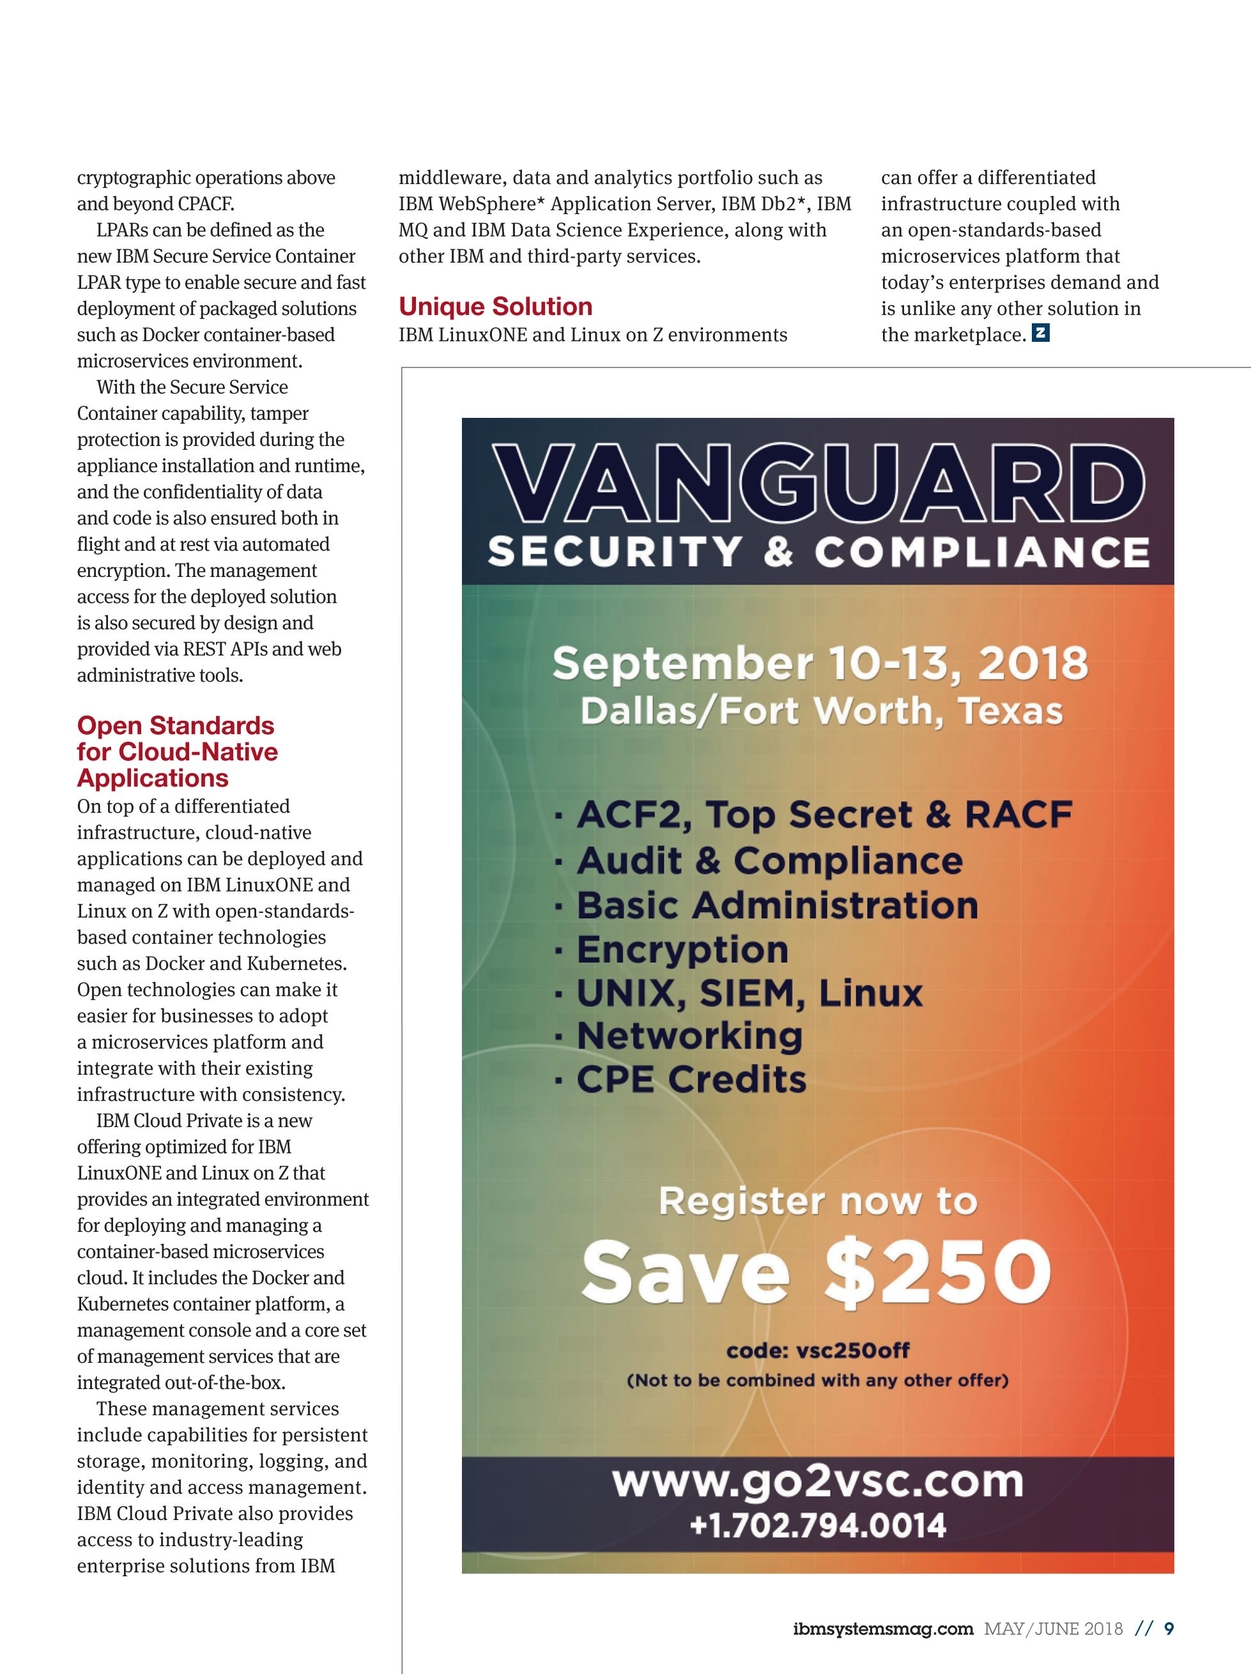 IBM Systems Magazine, Mainframe - May/June 2018